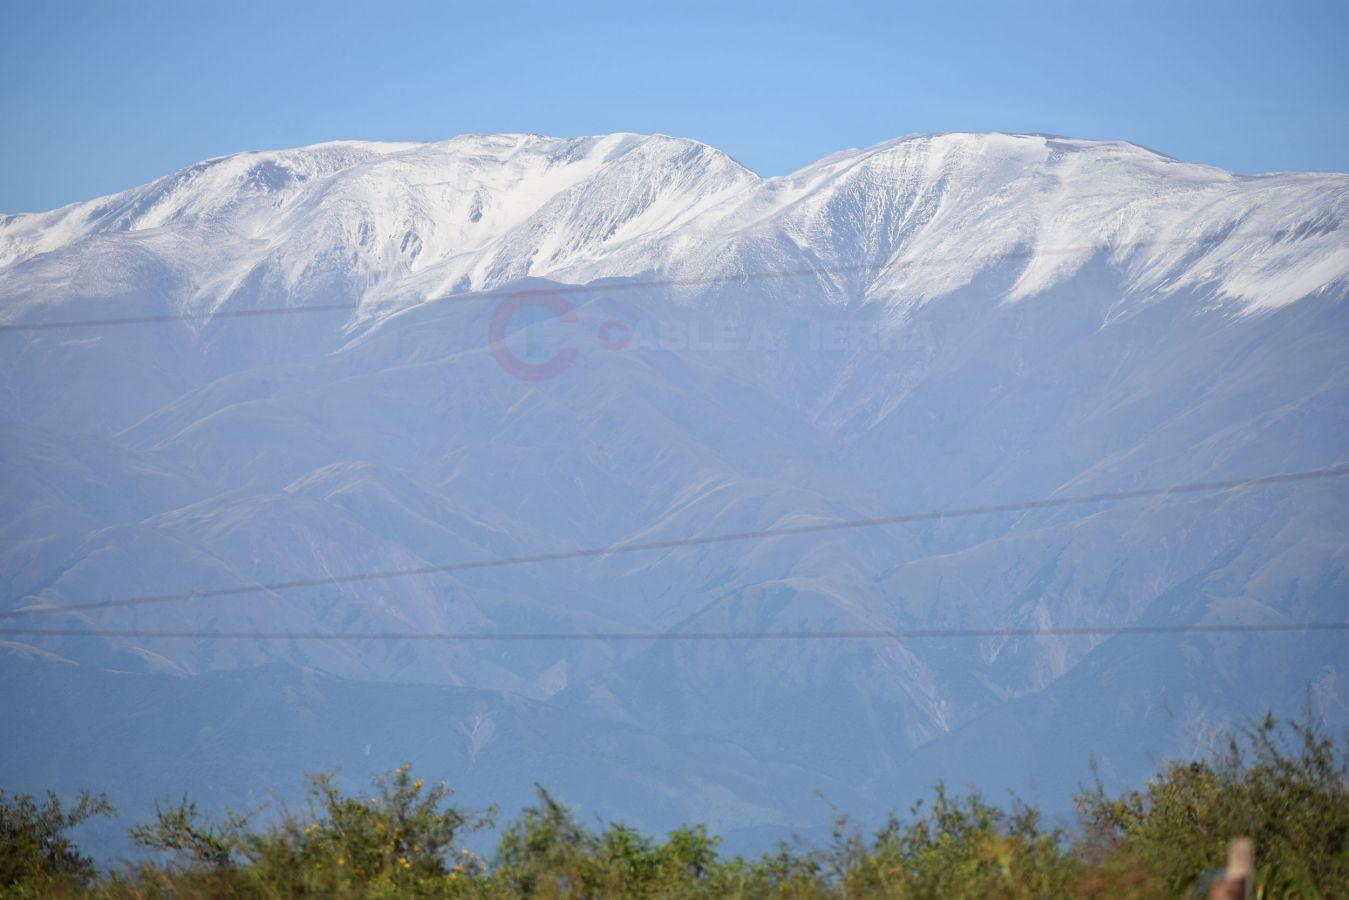 Fria mañana en Salta